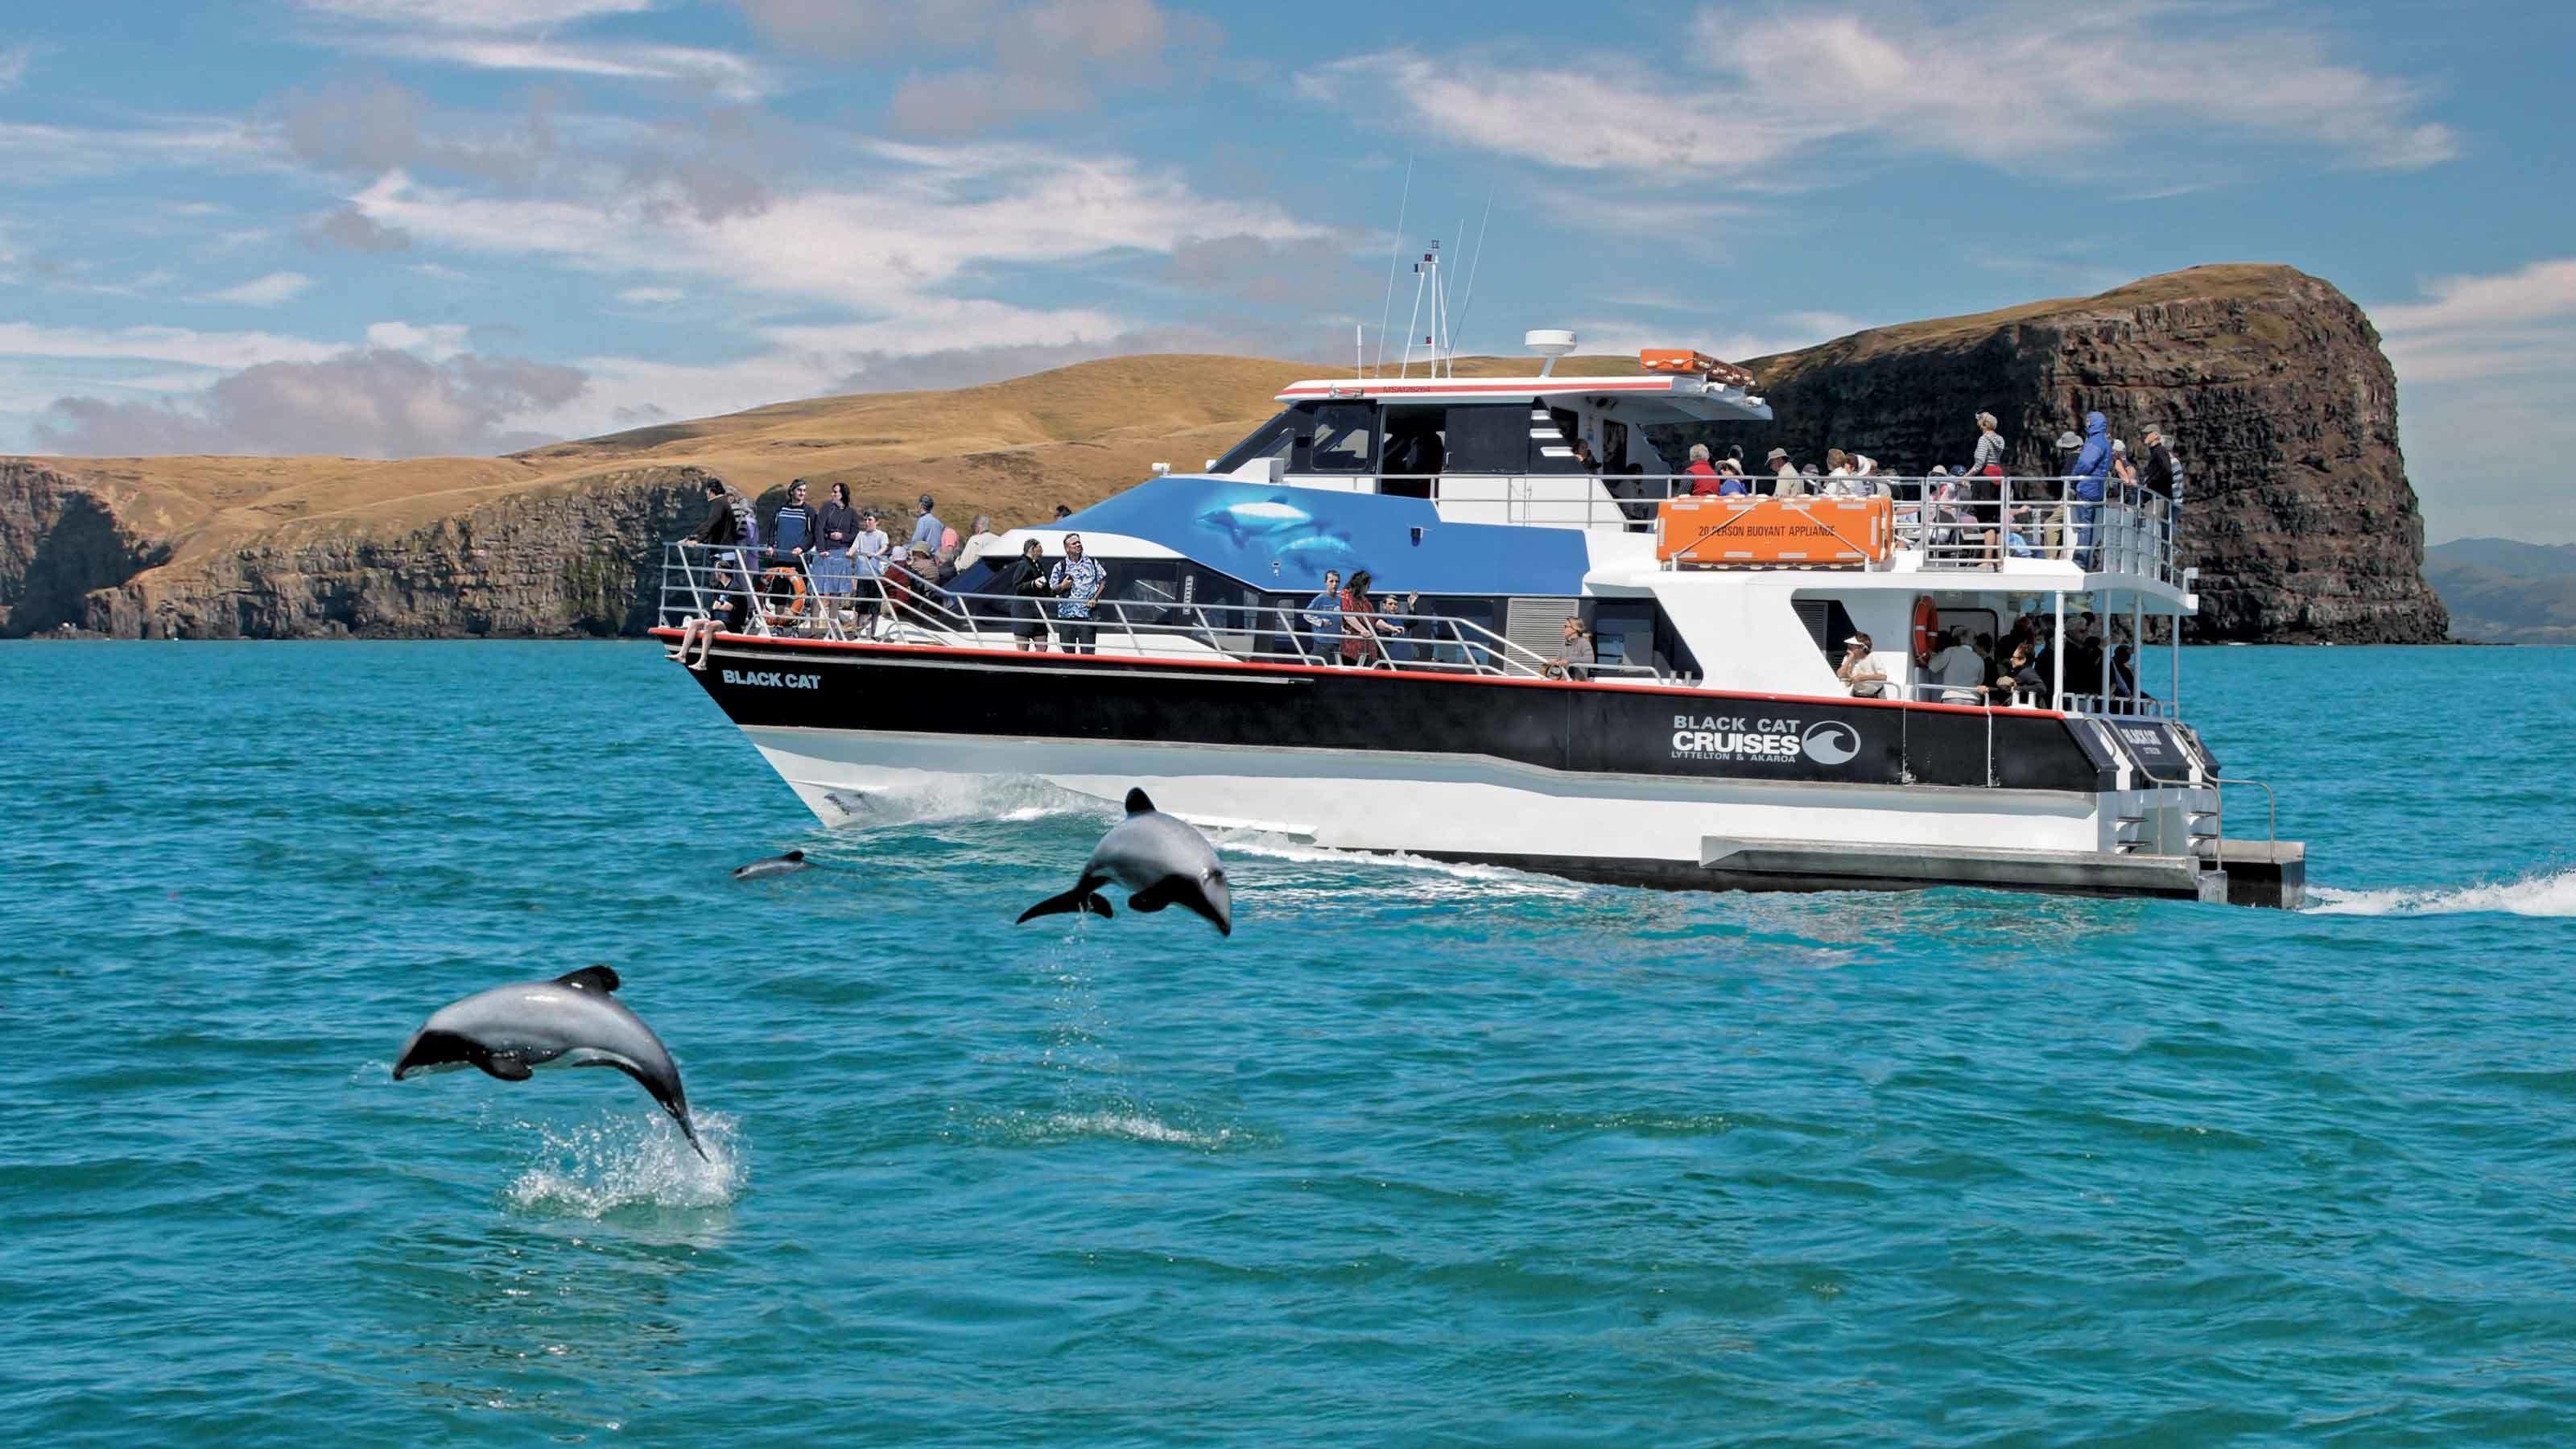 Akaroa Cruise Excursion - Harbor Nature Cruise